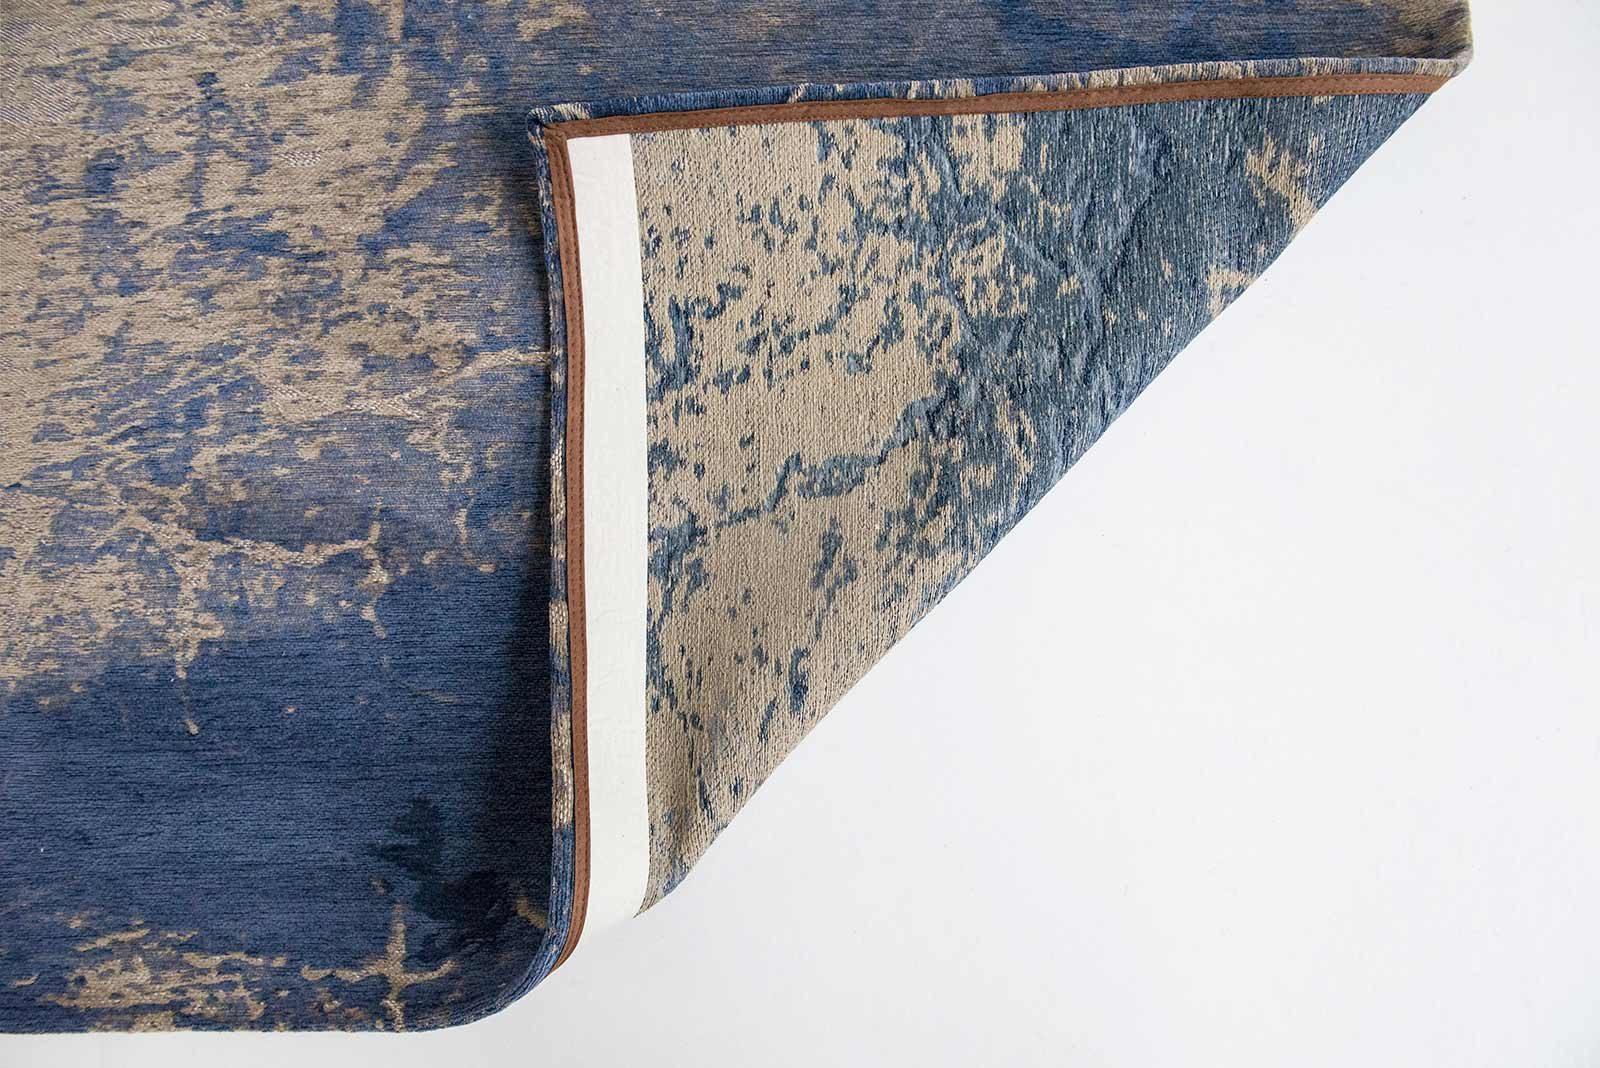 alfombras Louis De Poortere LX8629 Mad Men Cracks Abyss Blue back